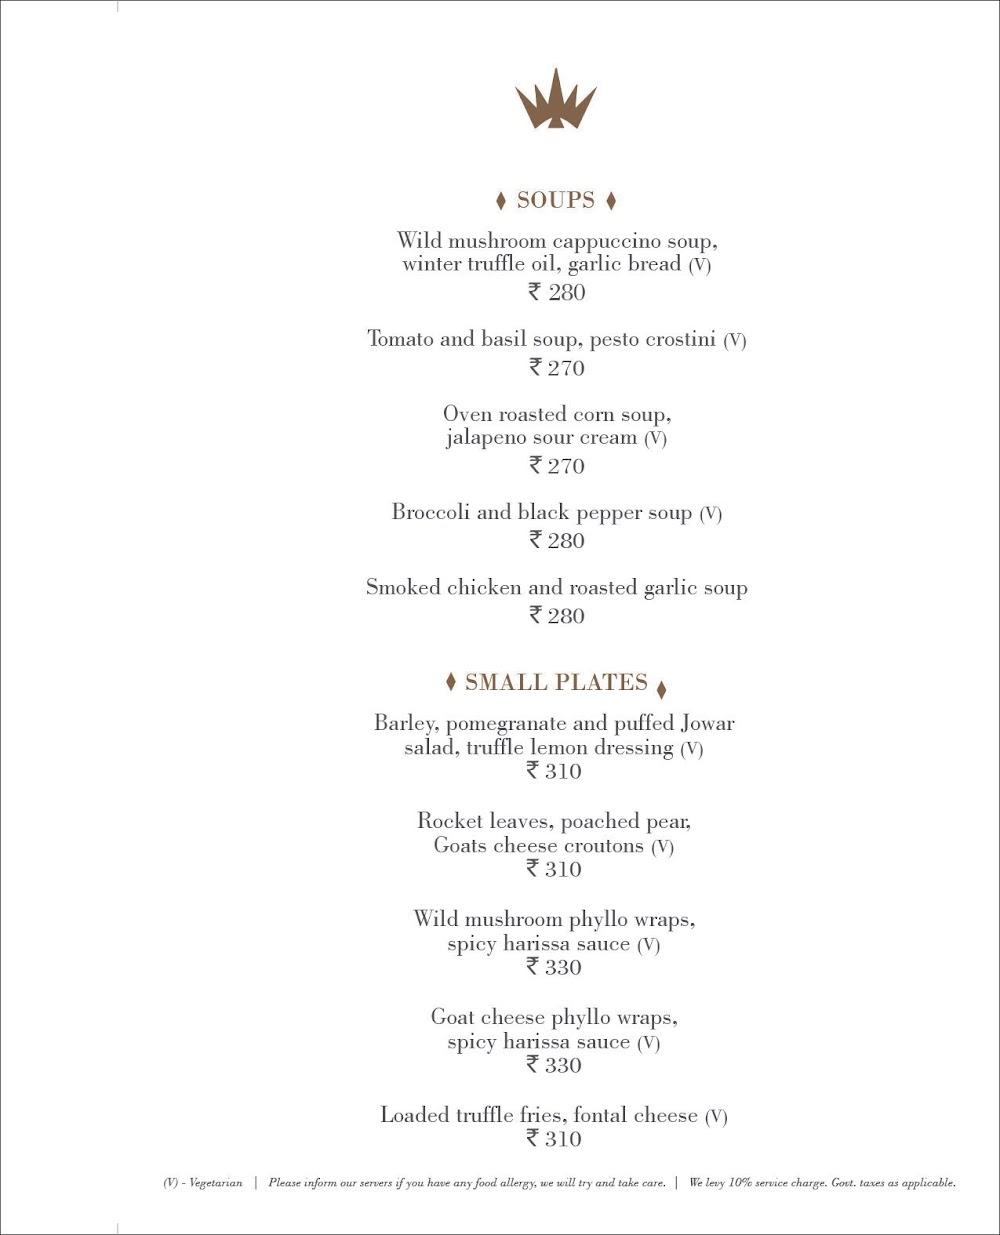 Pranzi menu 8